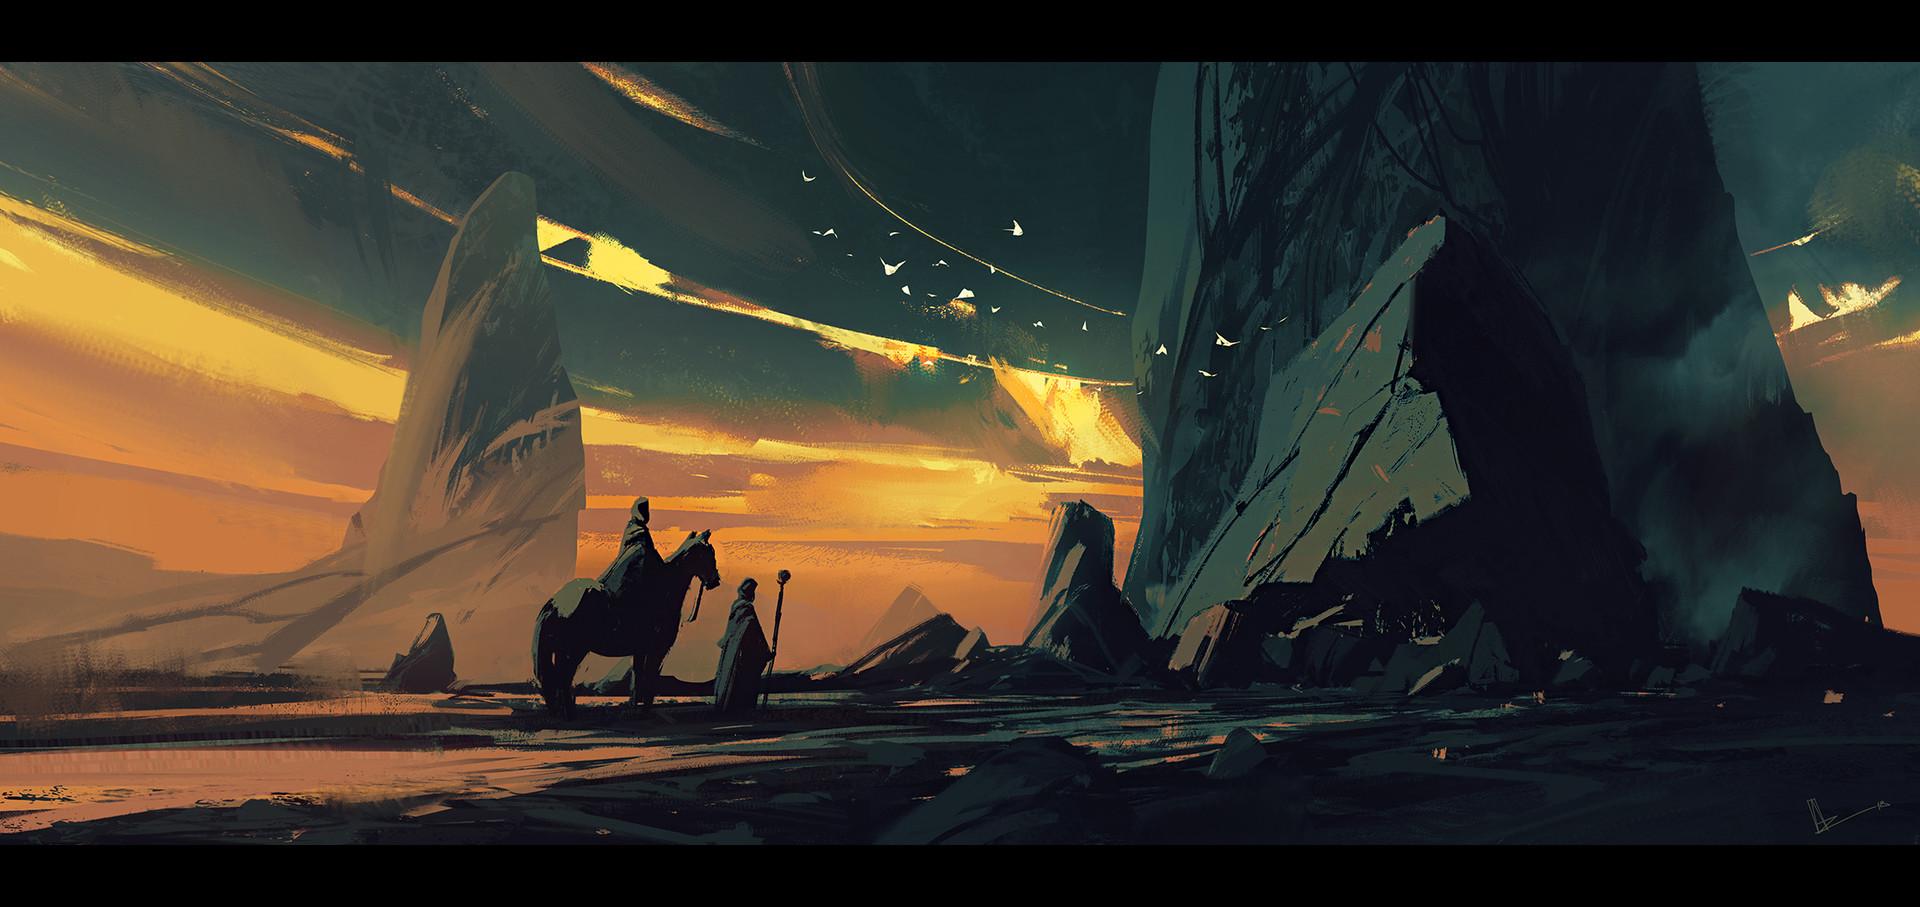 Amir zand travelers